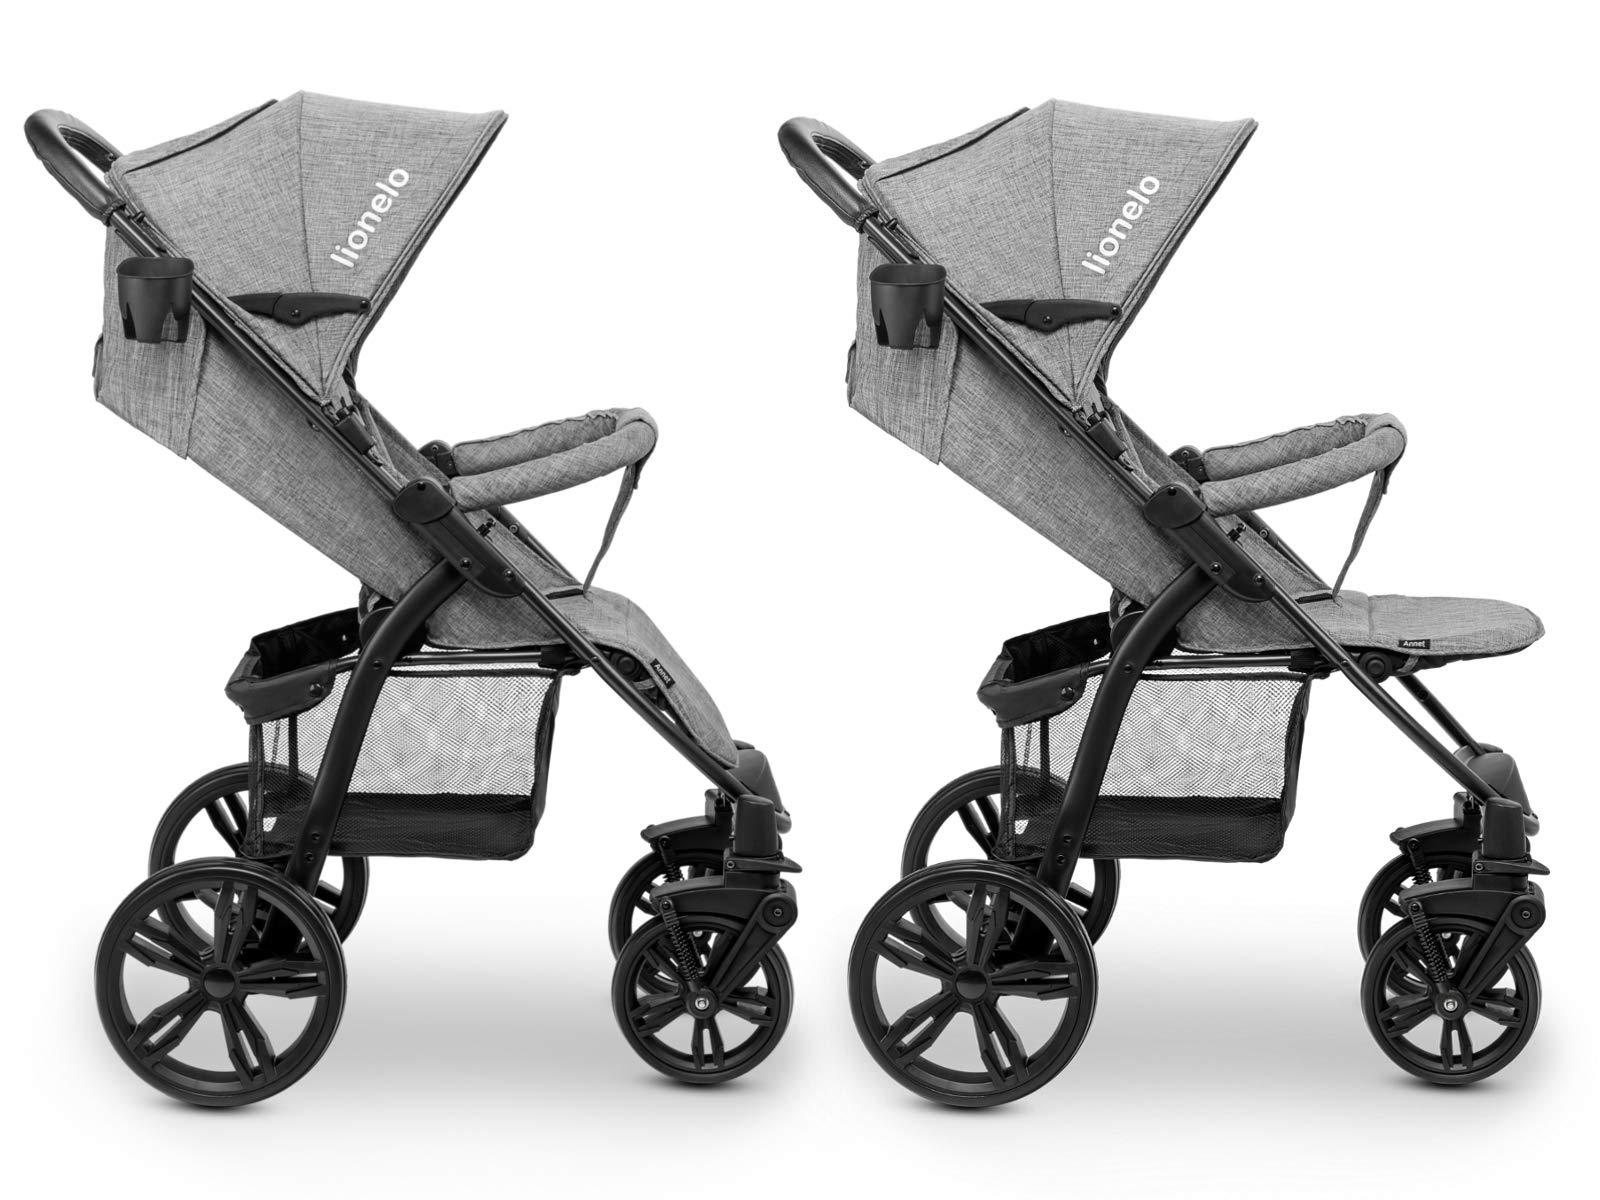 Lionelo 5902581656278 LO-Annet Concrete Stroller Pushchair (Light-Gray)   8